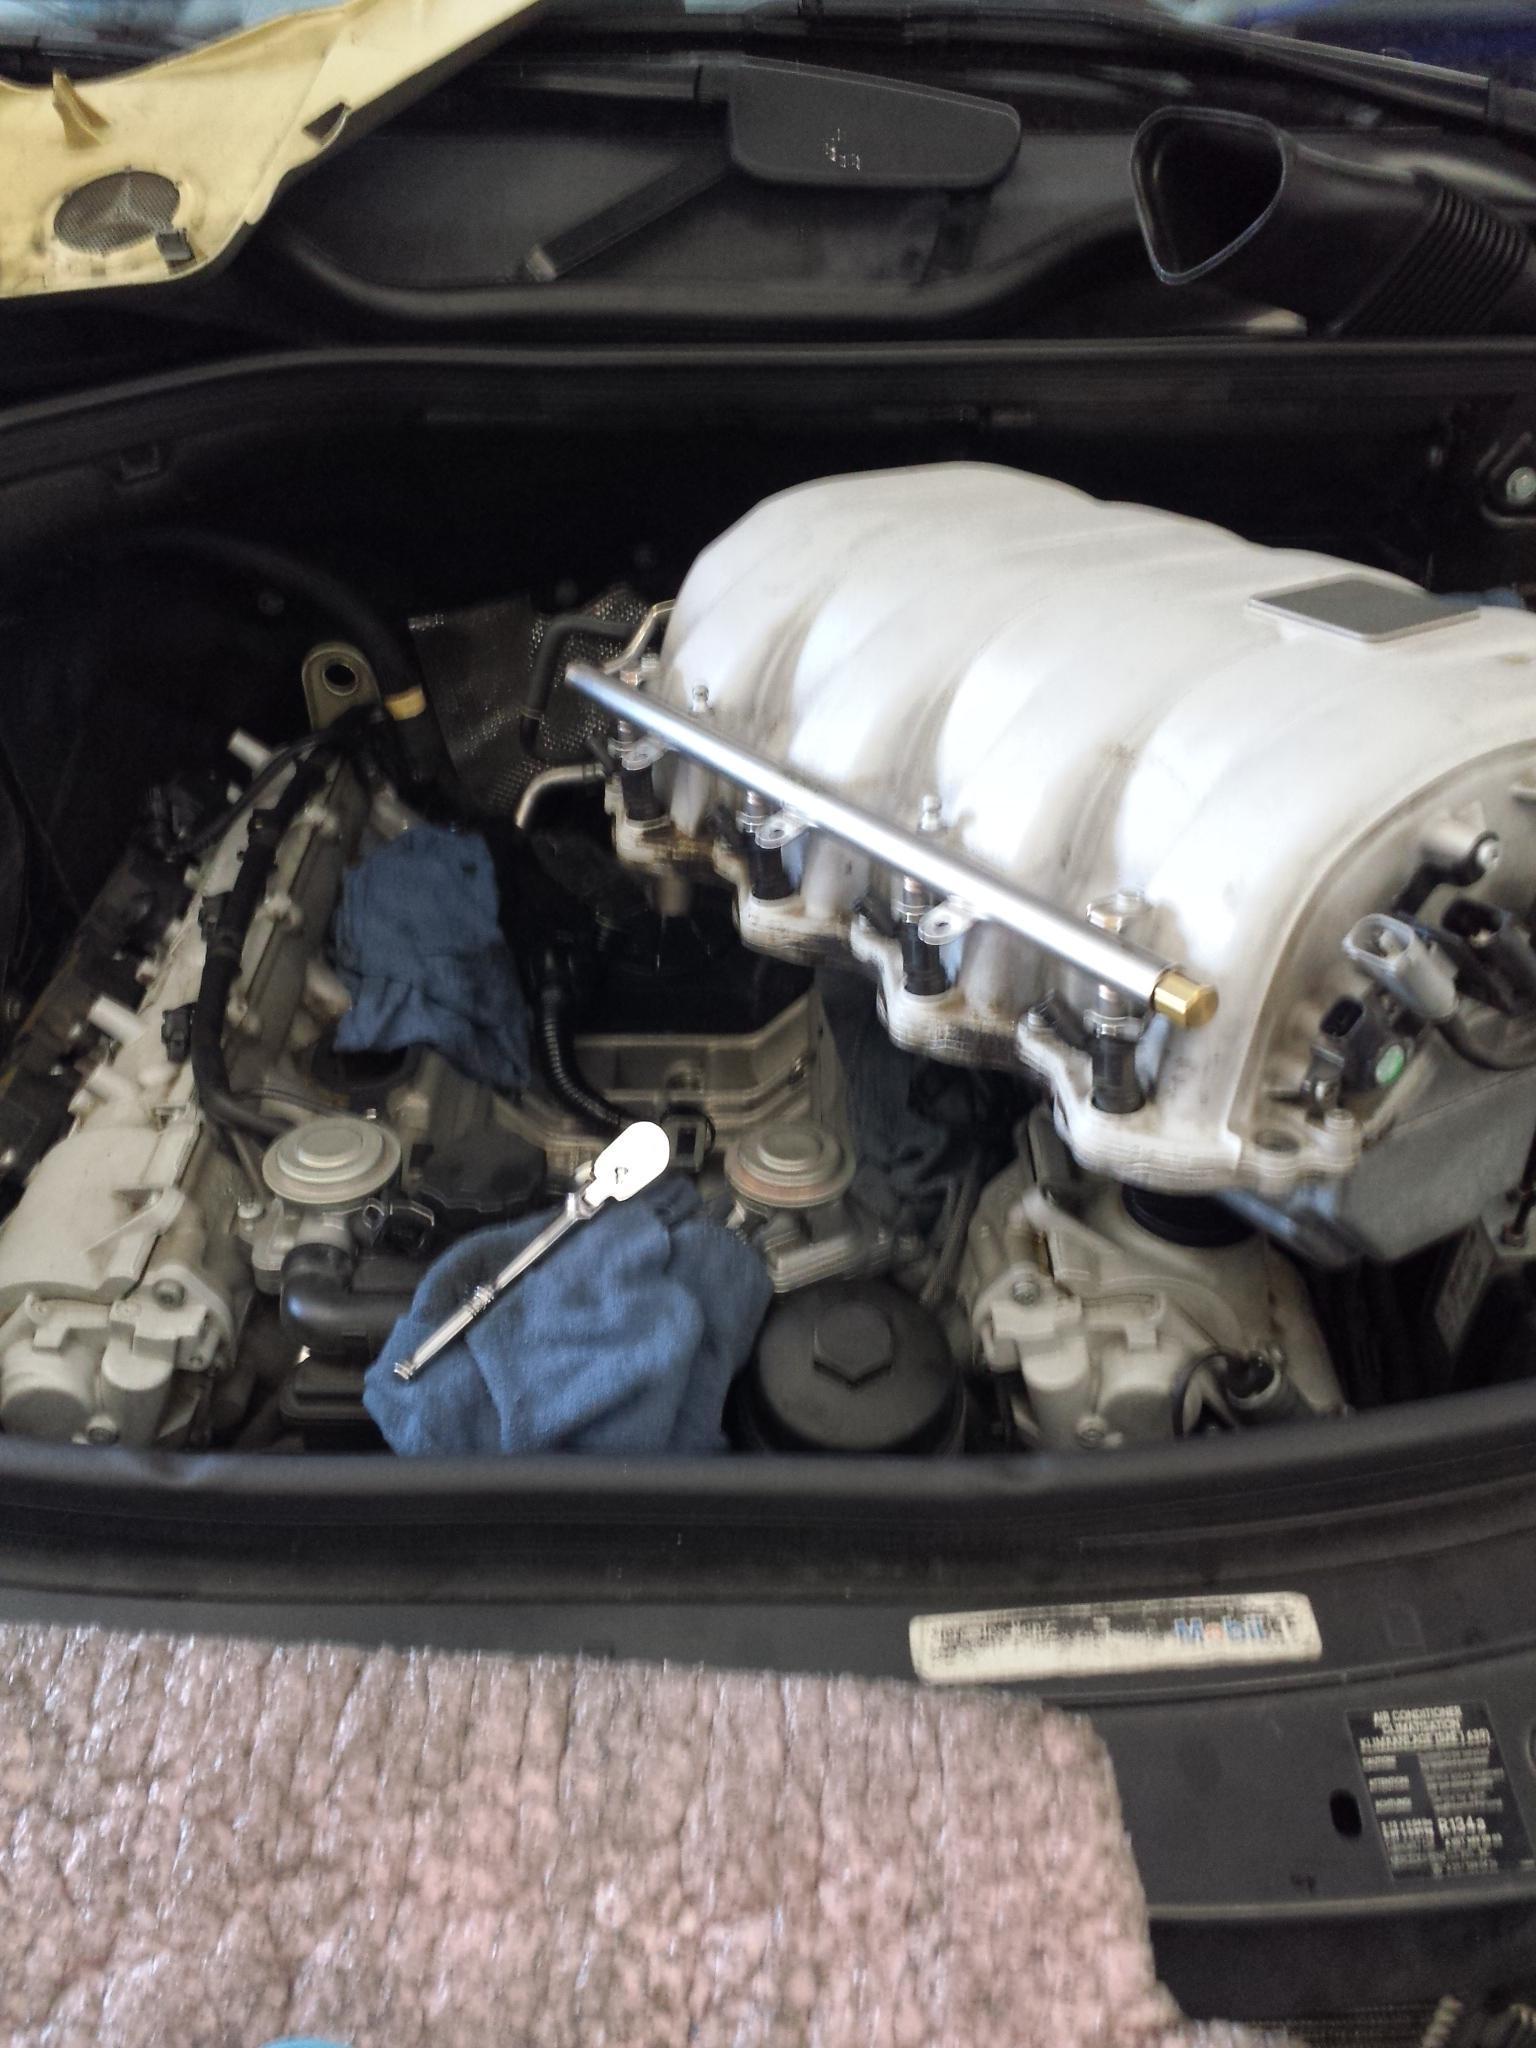 Auto Repair Business In Sacramento Ca United States